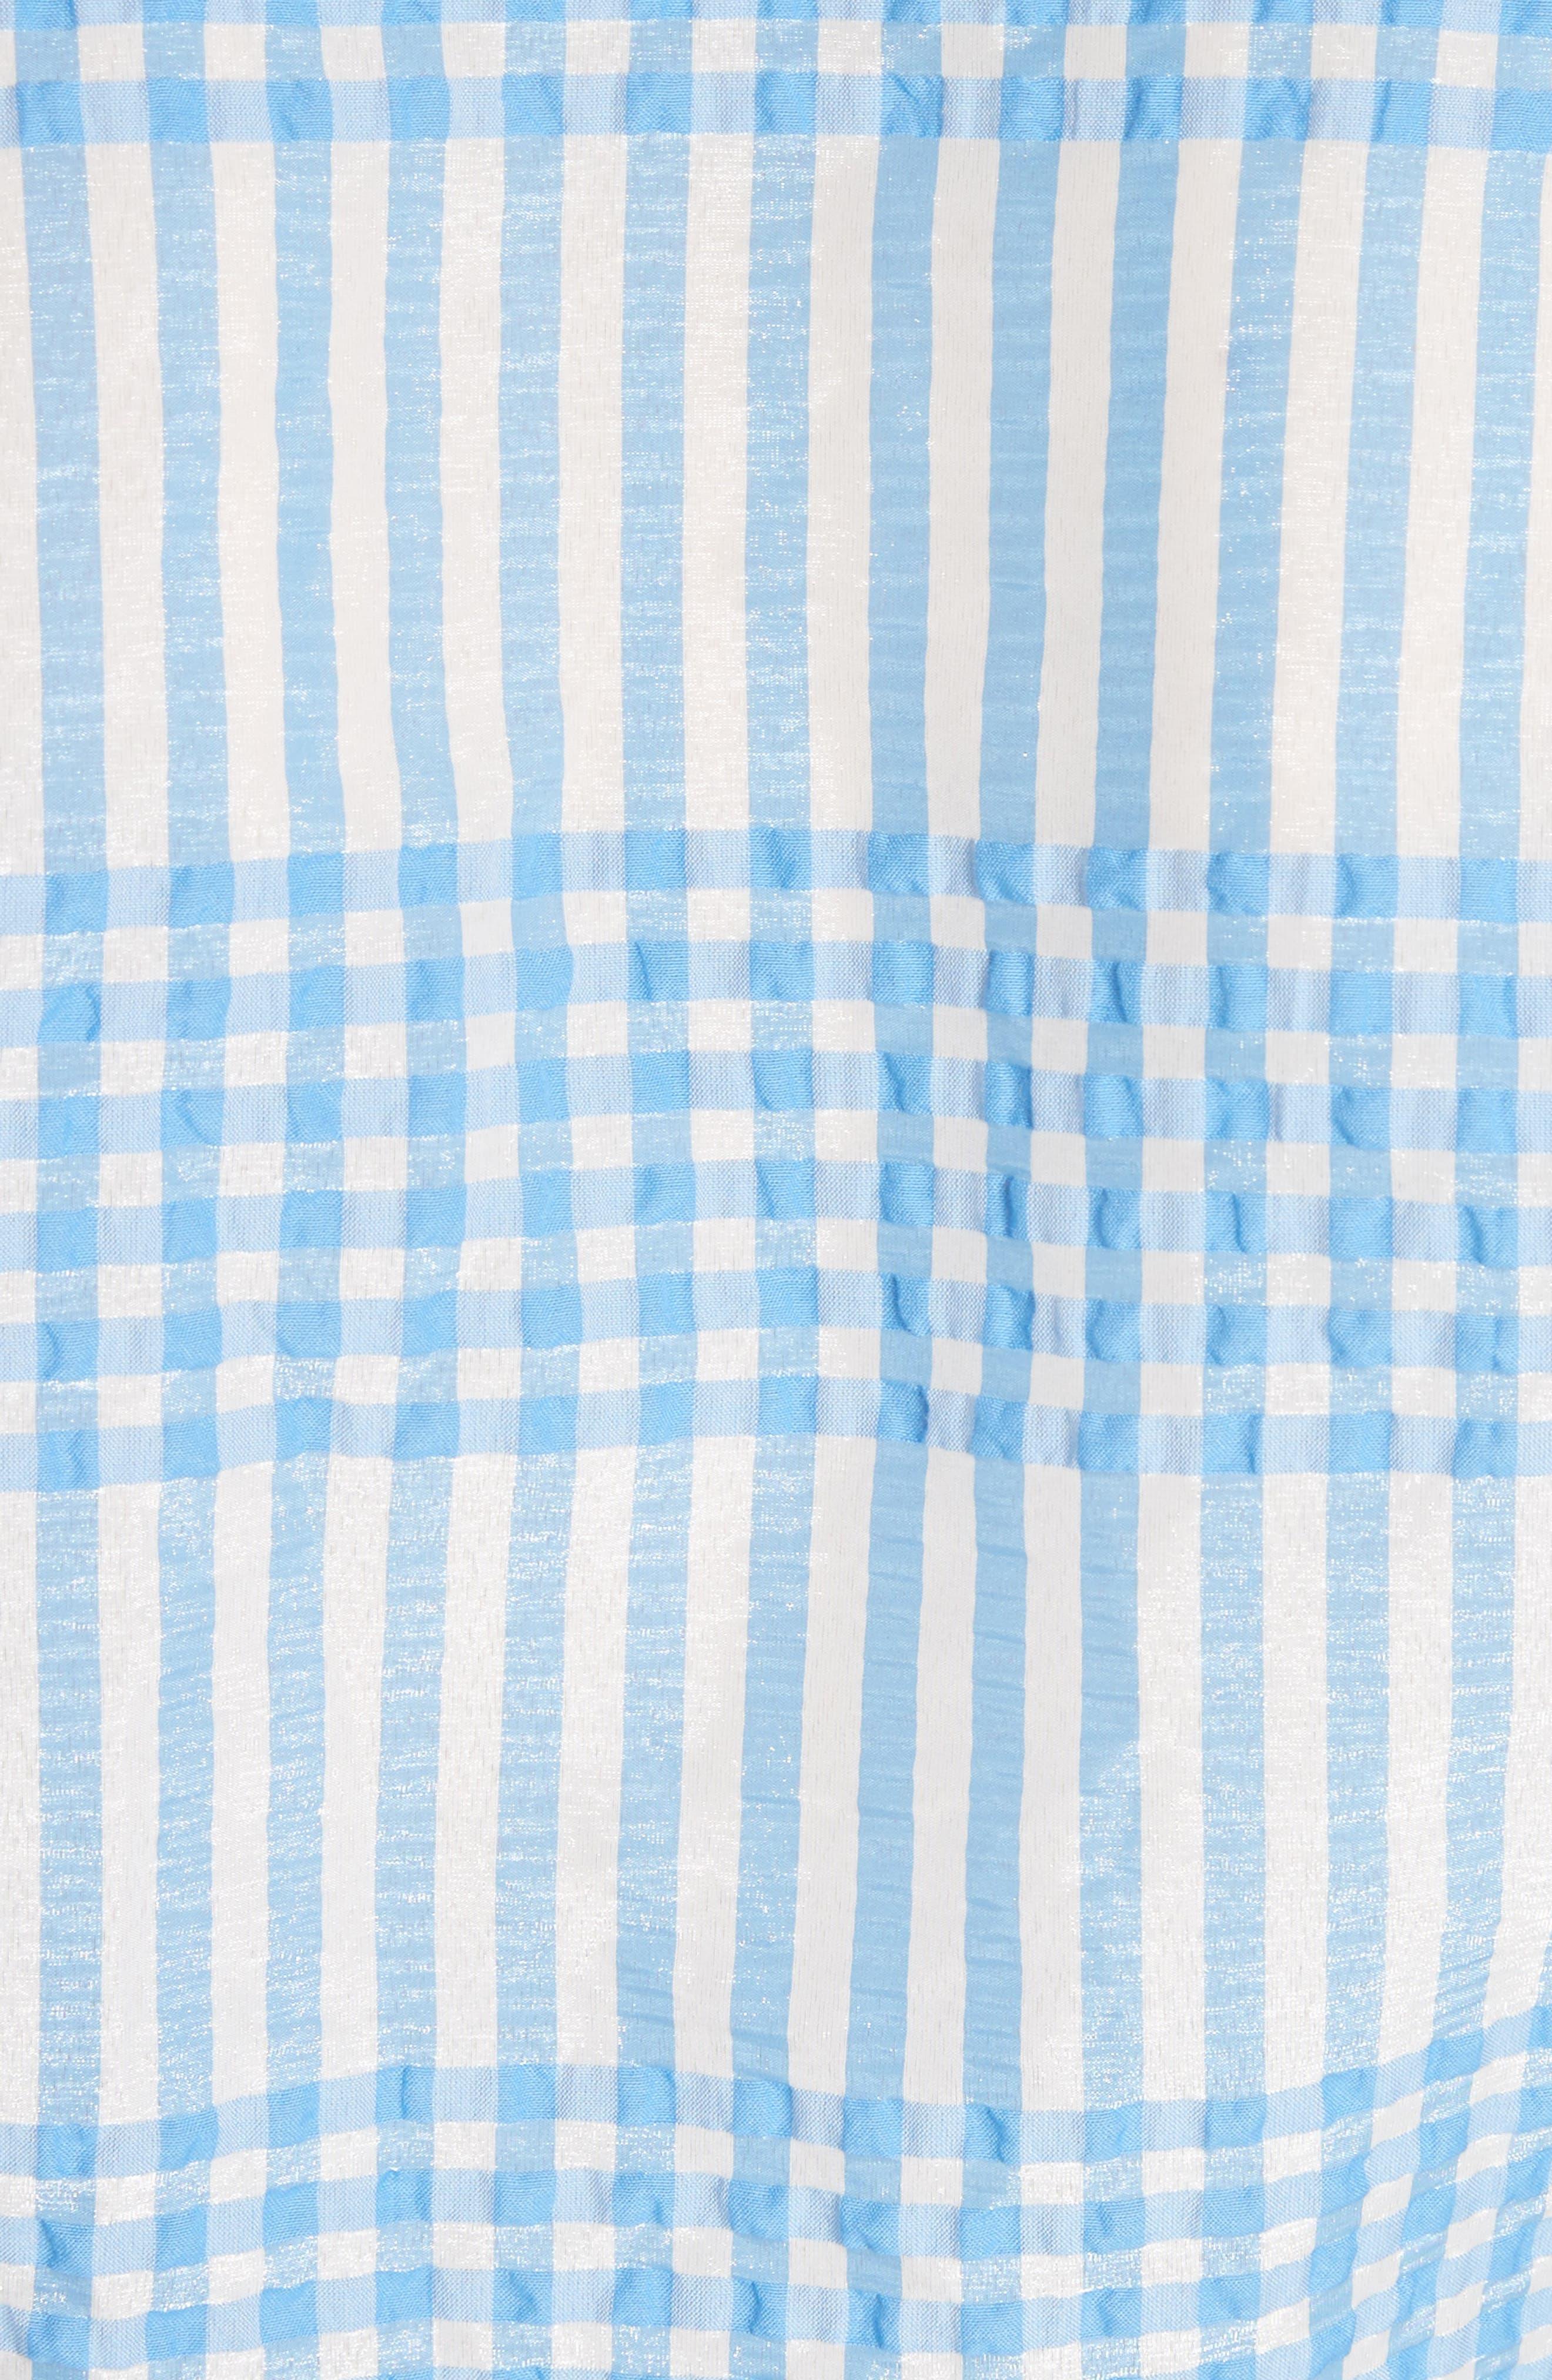 Charron Plaid Crop Blouse,                             Alternate thumbnail 5, color,                             Marina